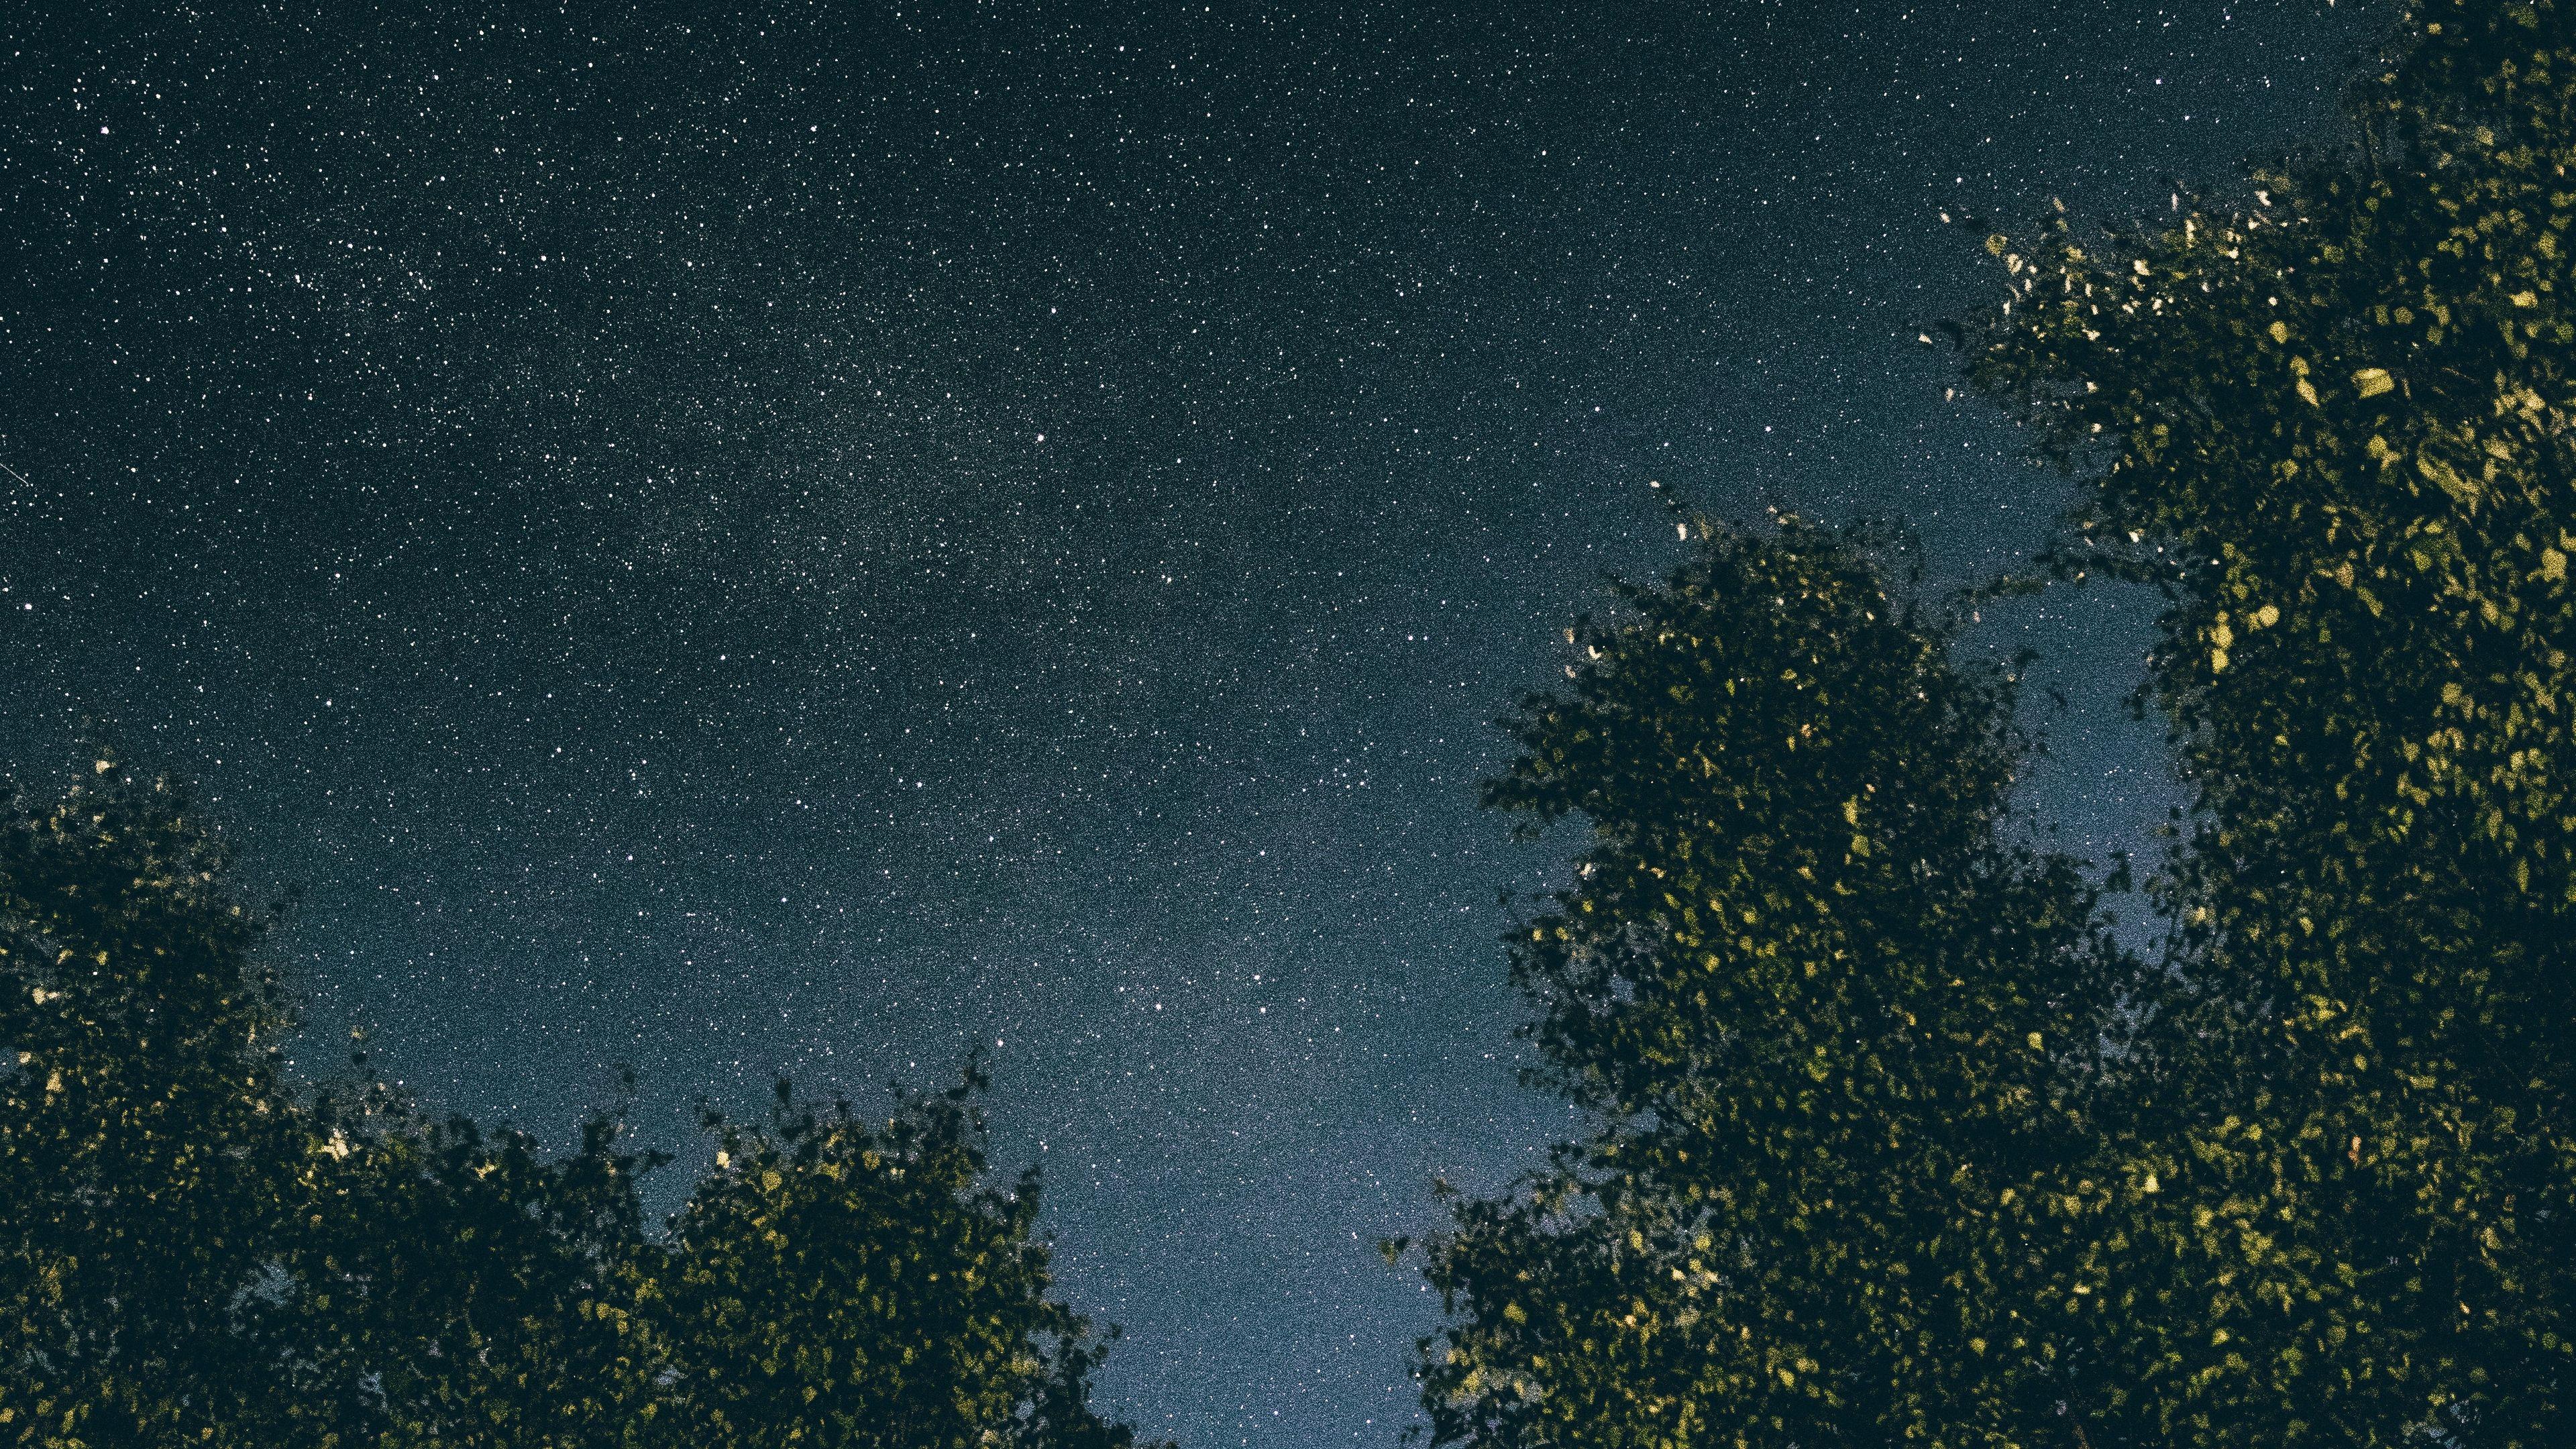 Trees Starry Sky Stars Night 4k Trees Stars Starry Sky Starry Sky Sky Starry Wallpaper night starry sky lake trees